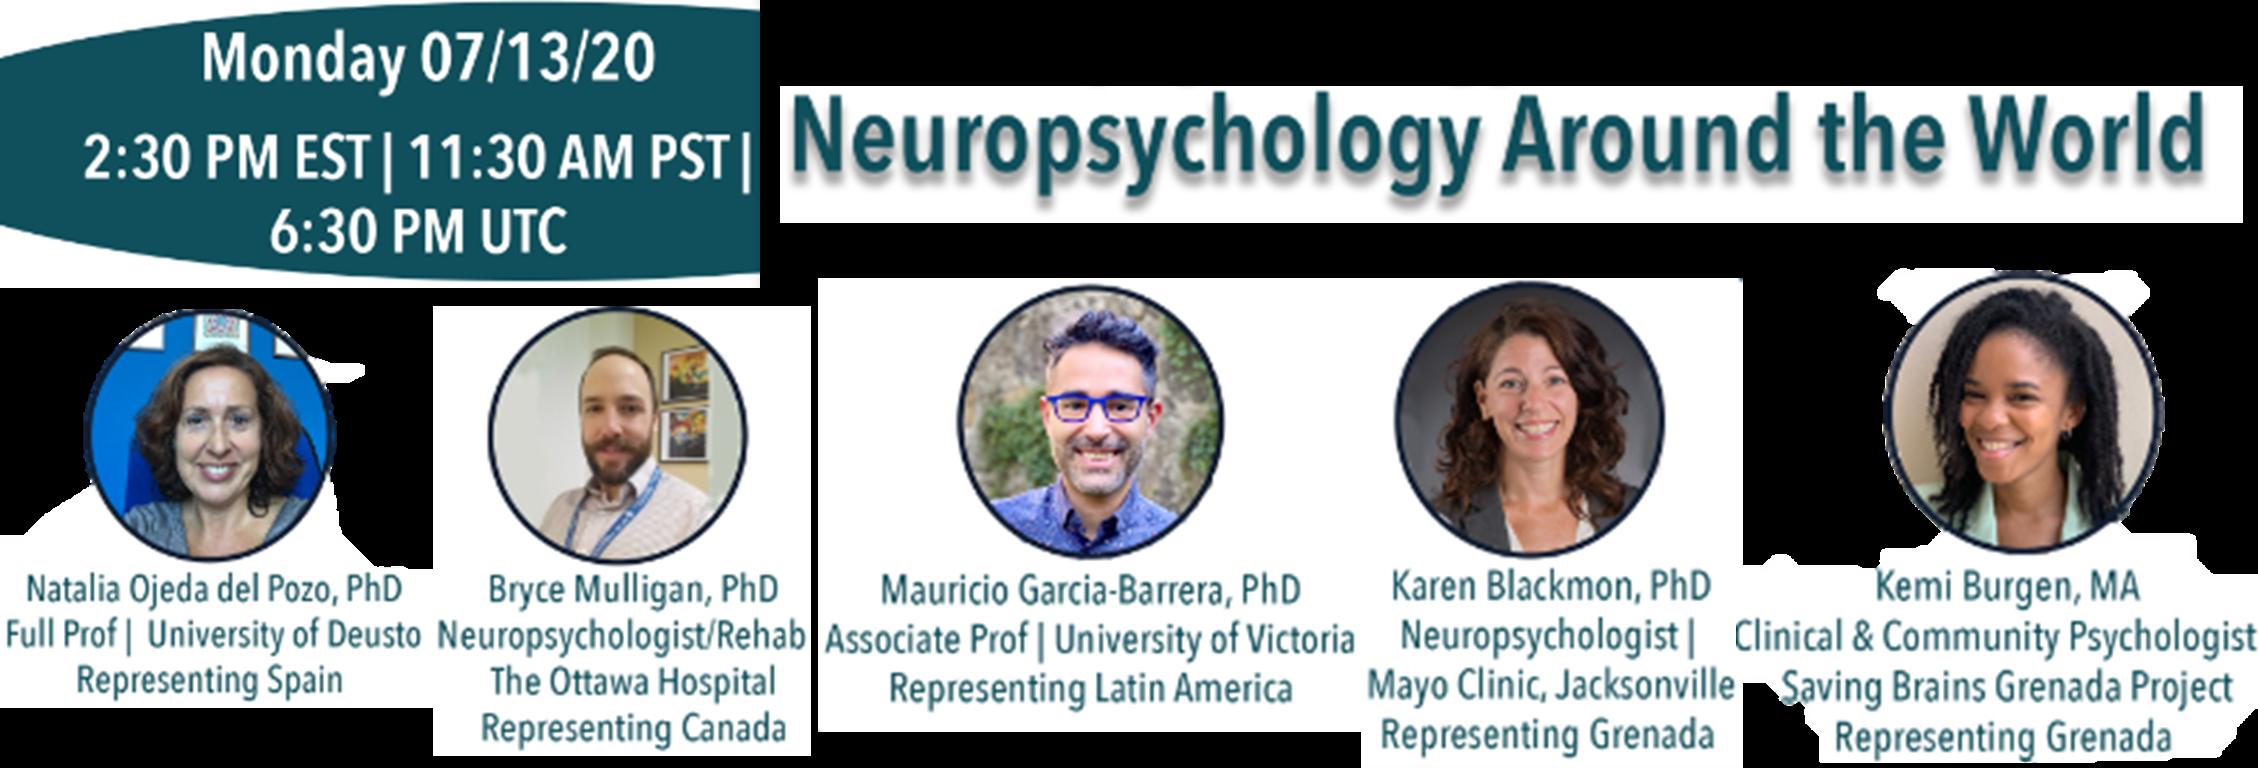 Neuropsychology Around the World